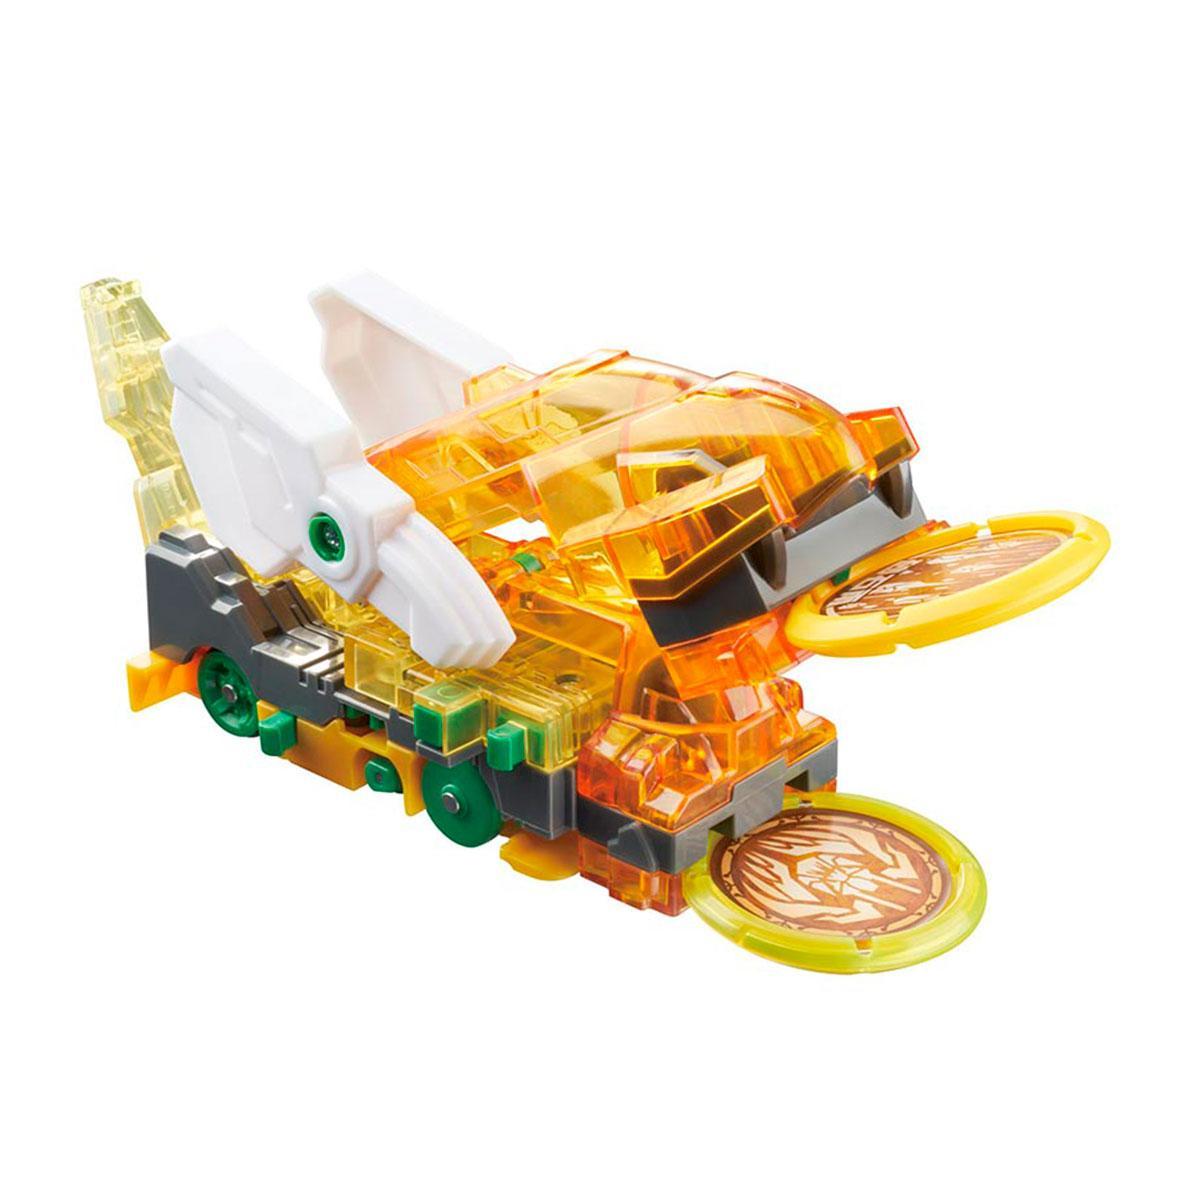 Screechers Wild! Машинка-трансформер S2 L2 - Табу, EU684403